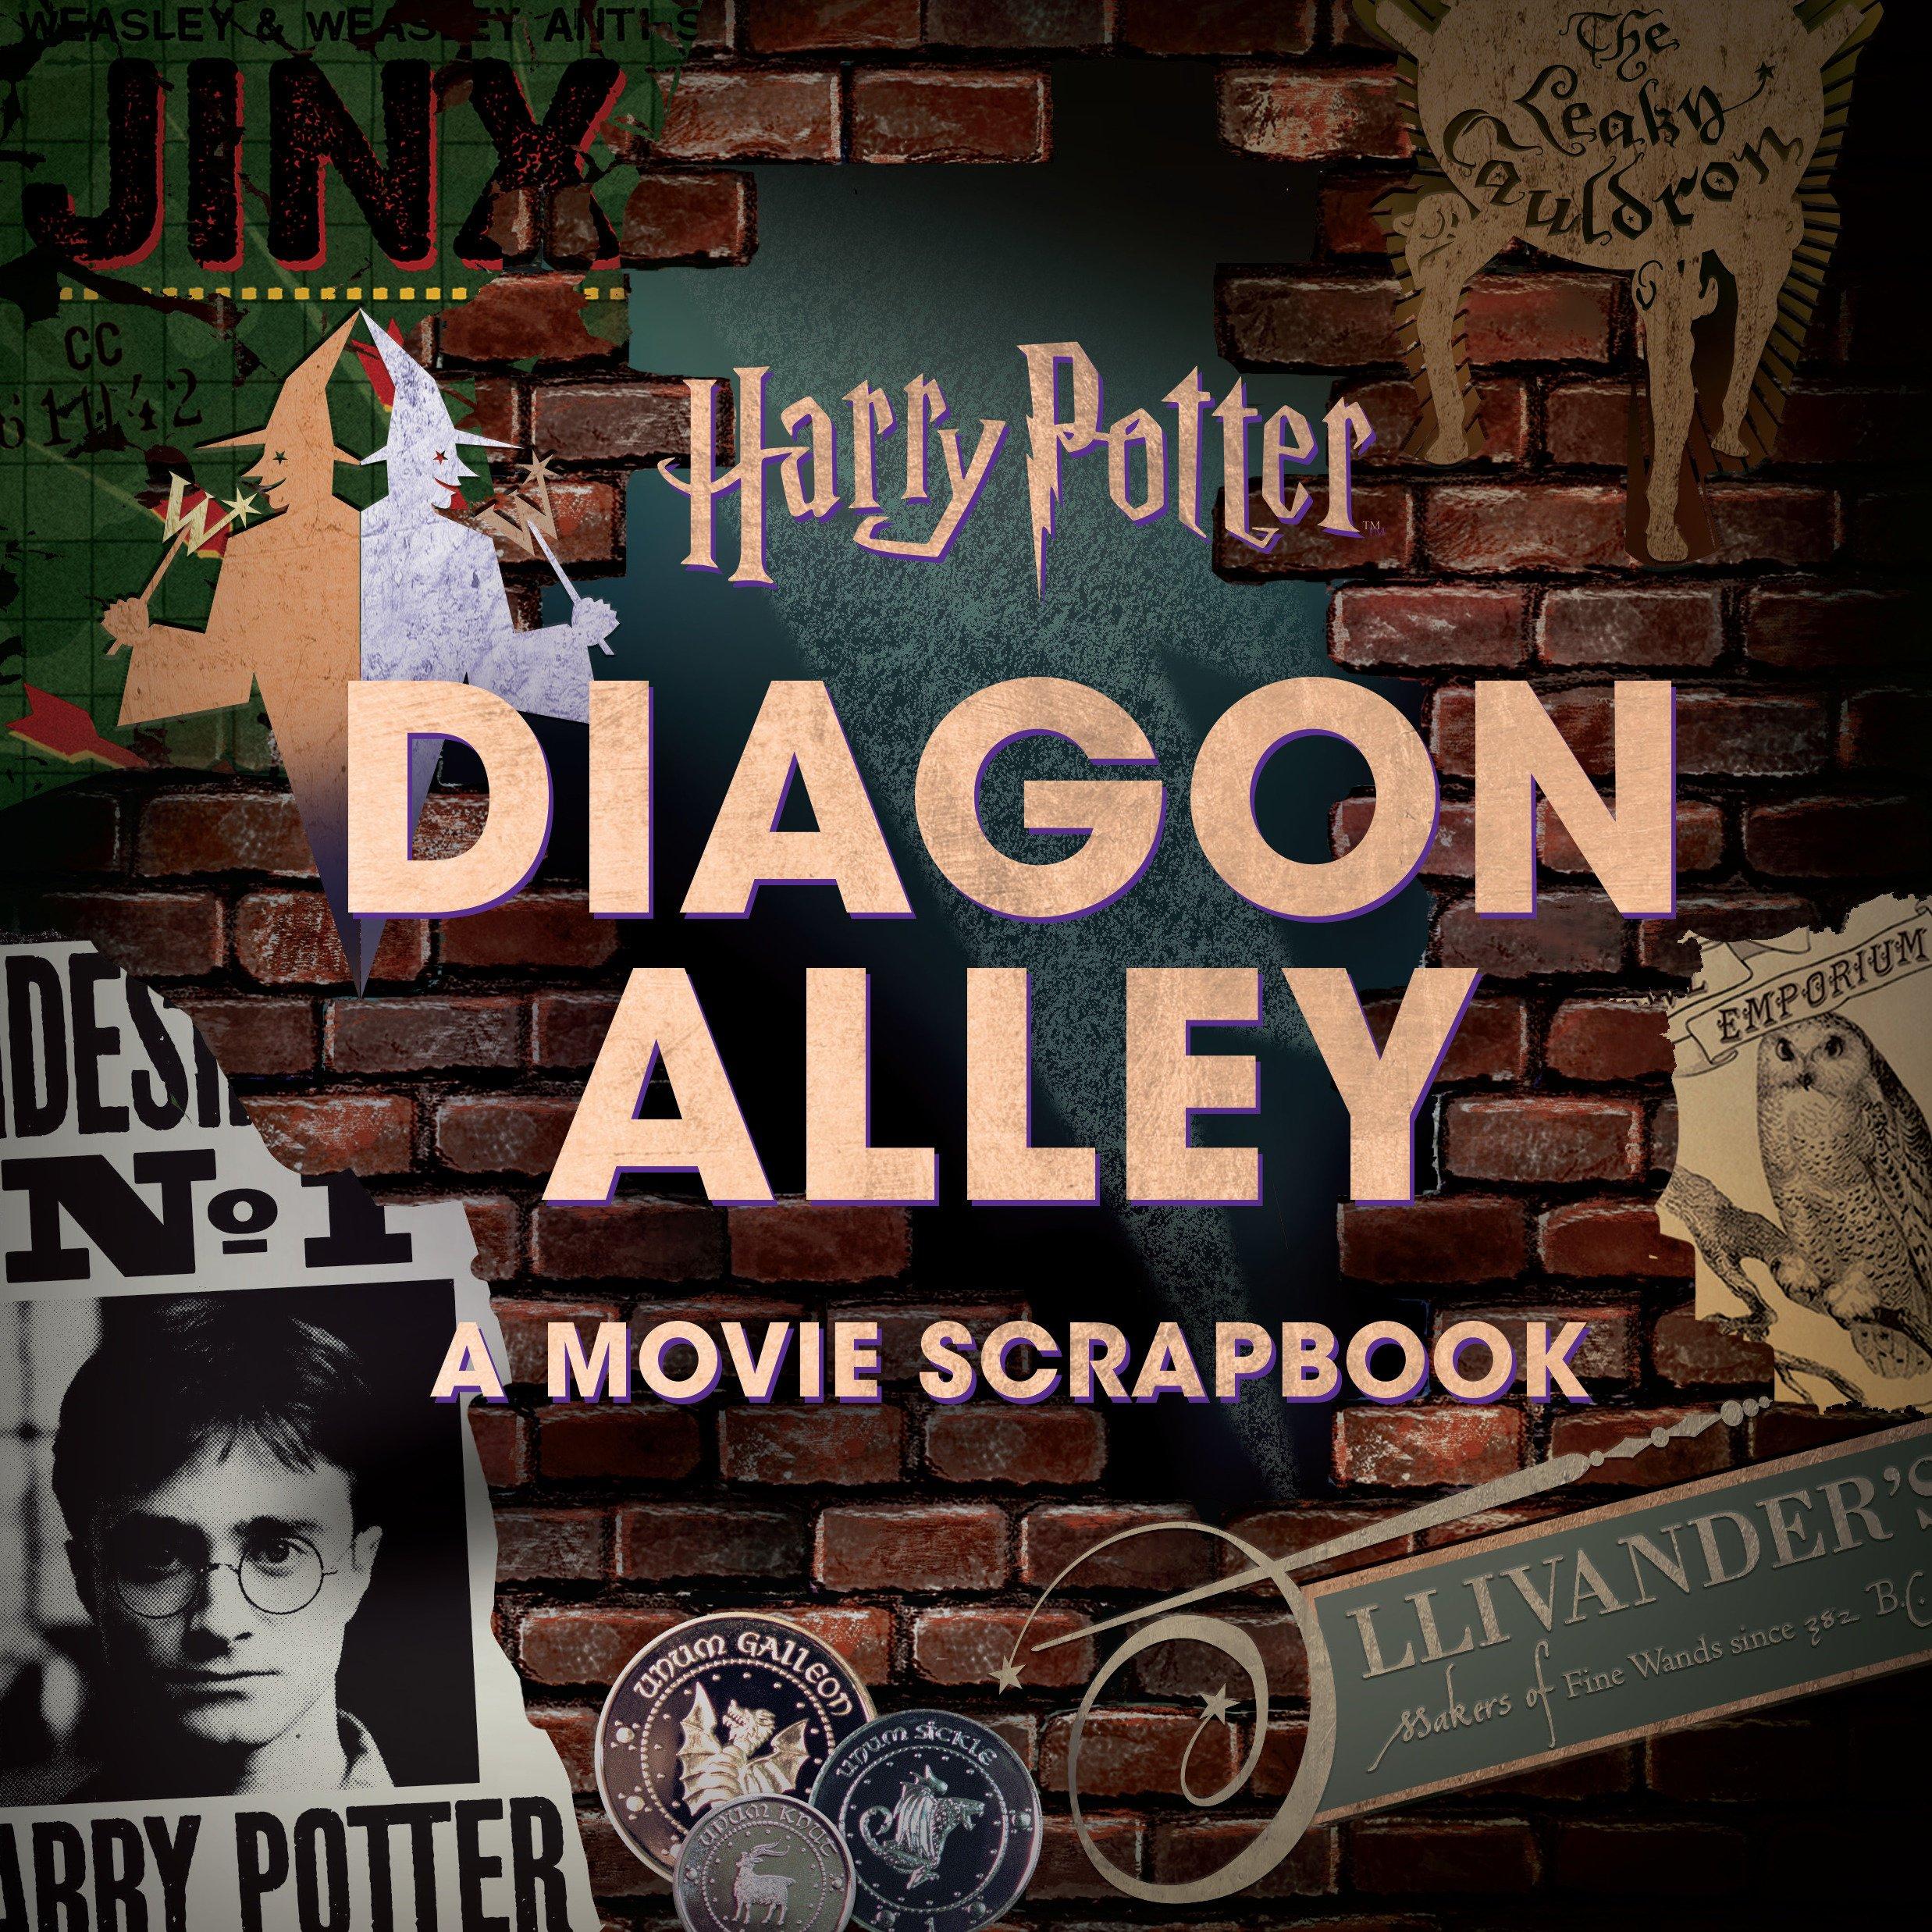 Harry Potter: Diagon Alley: A Movie Scrapbook